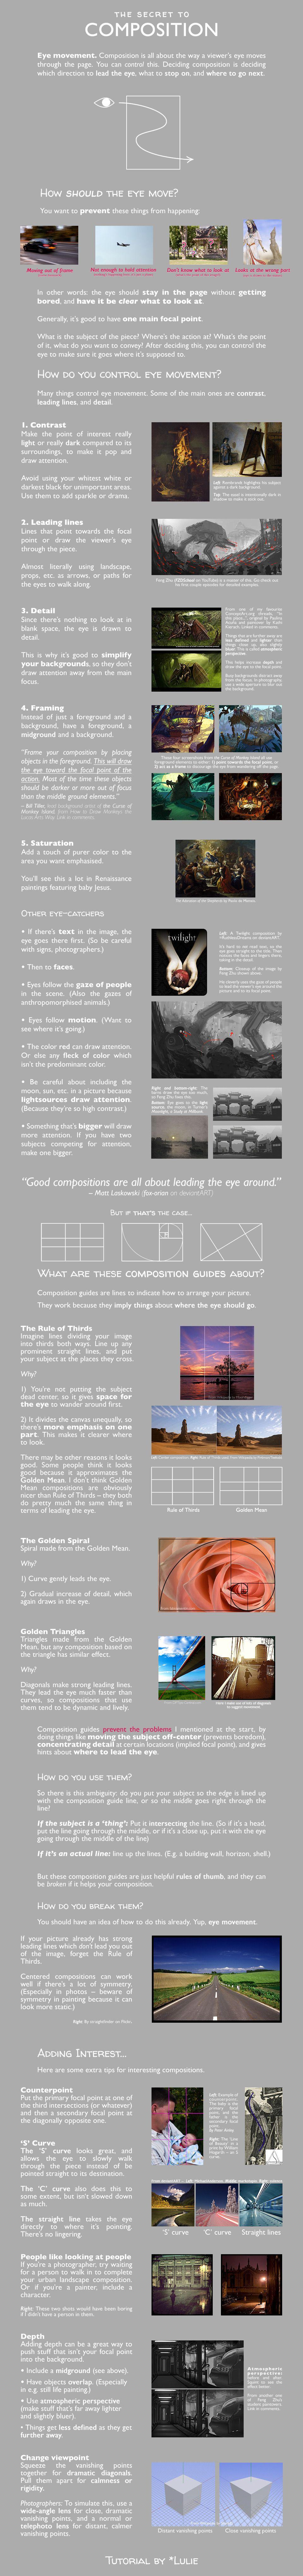 The Secret to Composition by lulie.deviantart.com ✤ || CHARACTER DESIGN…